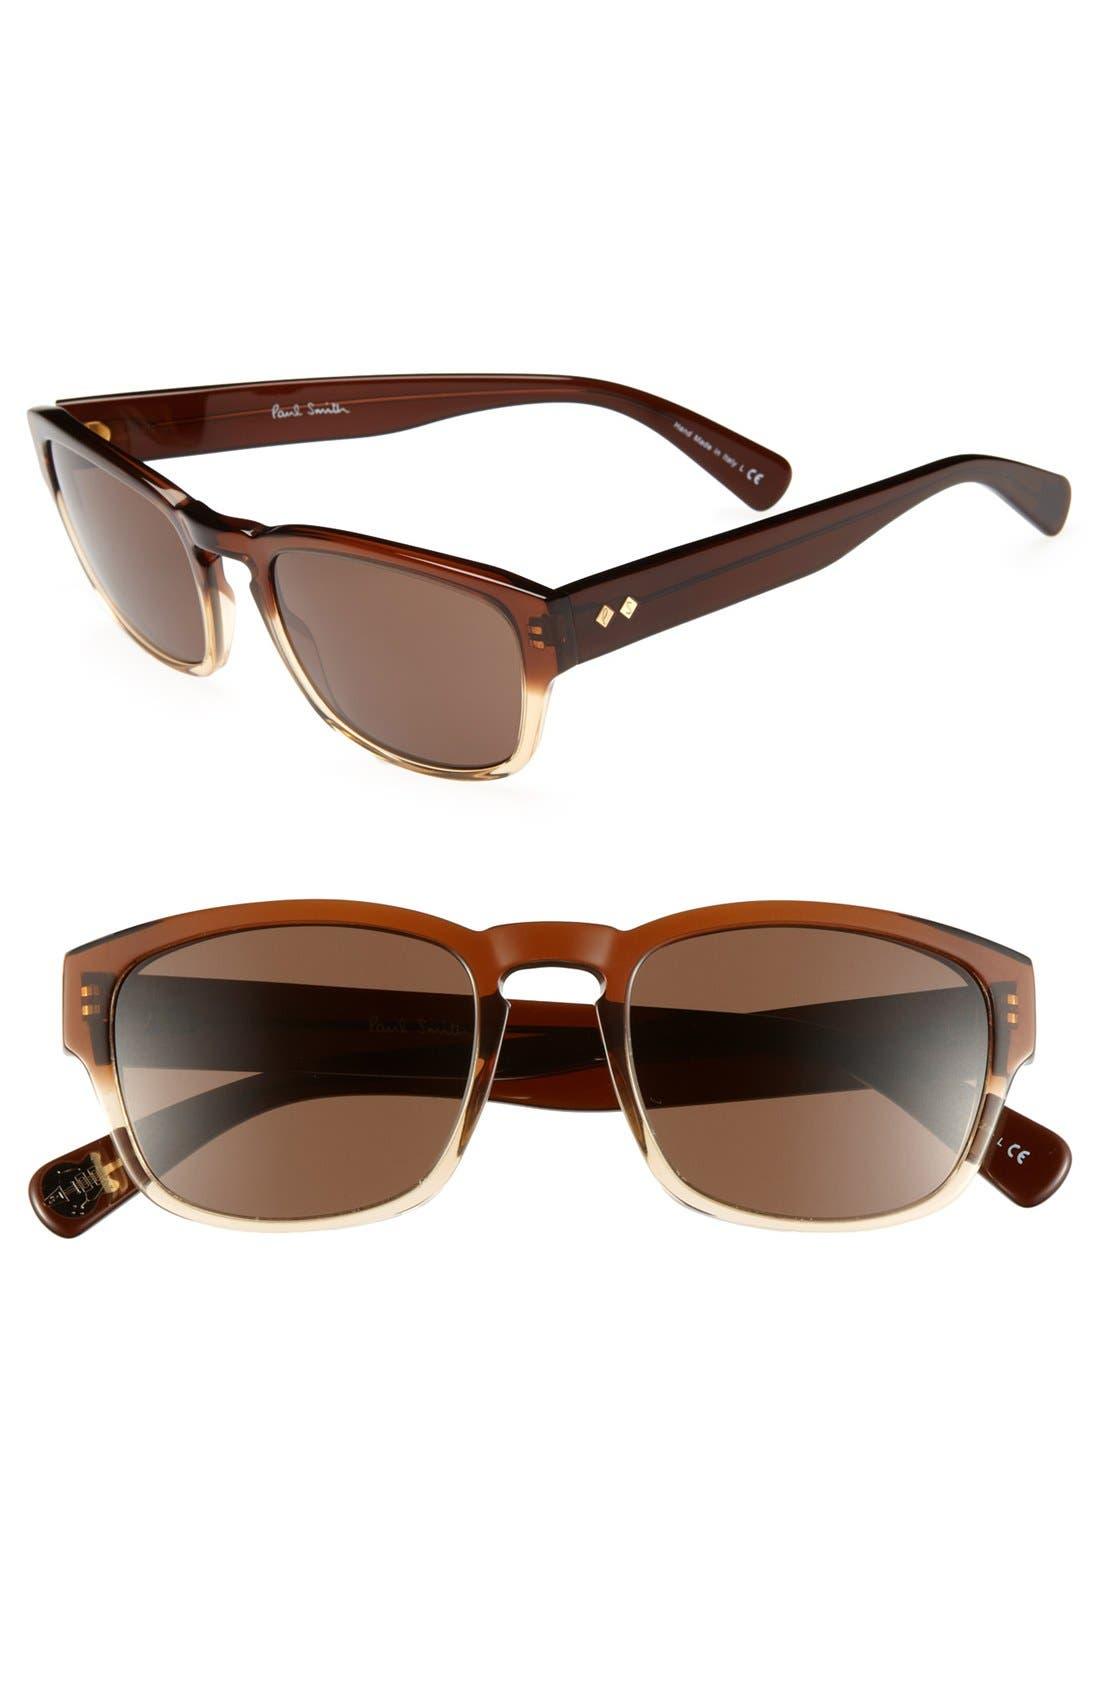 Main Image - Paul Smith 'Berling' 54mm Sunglasses